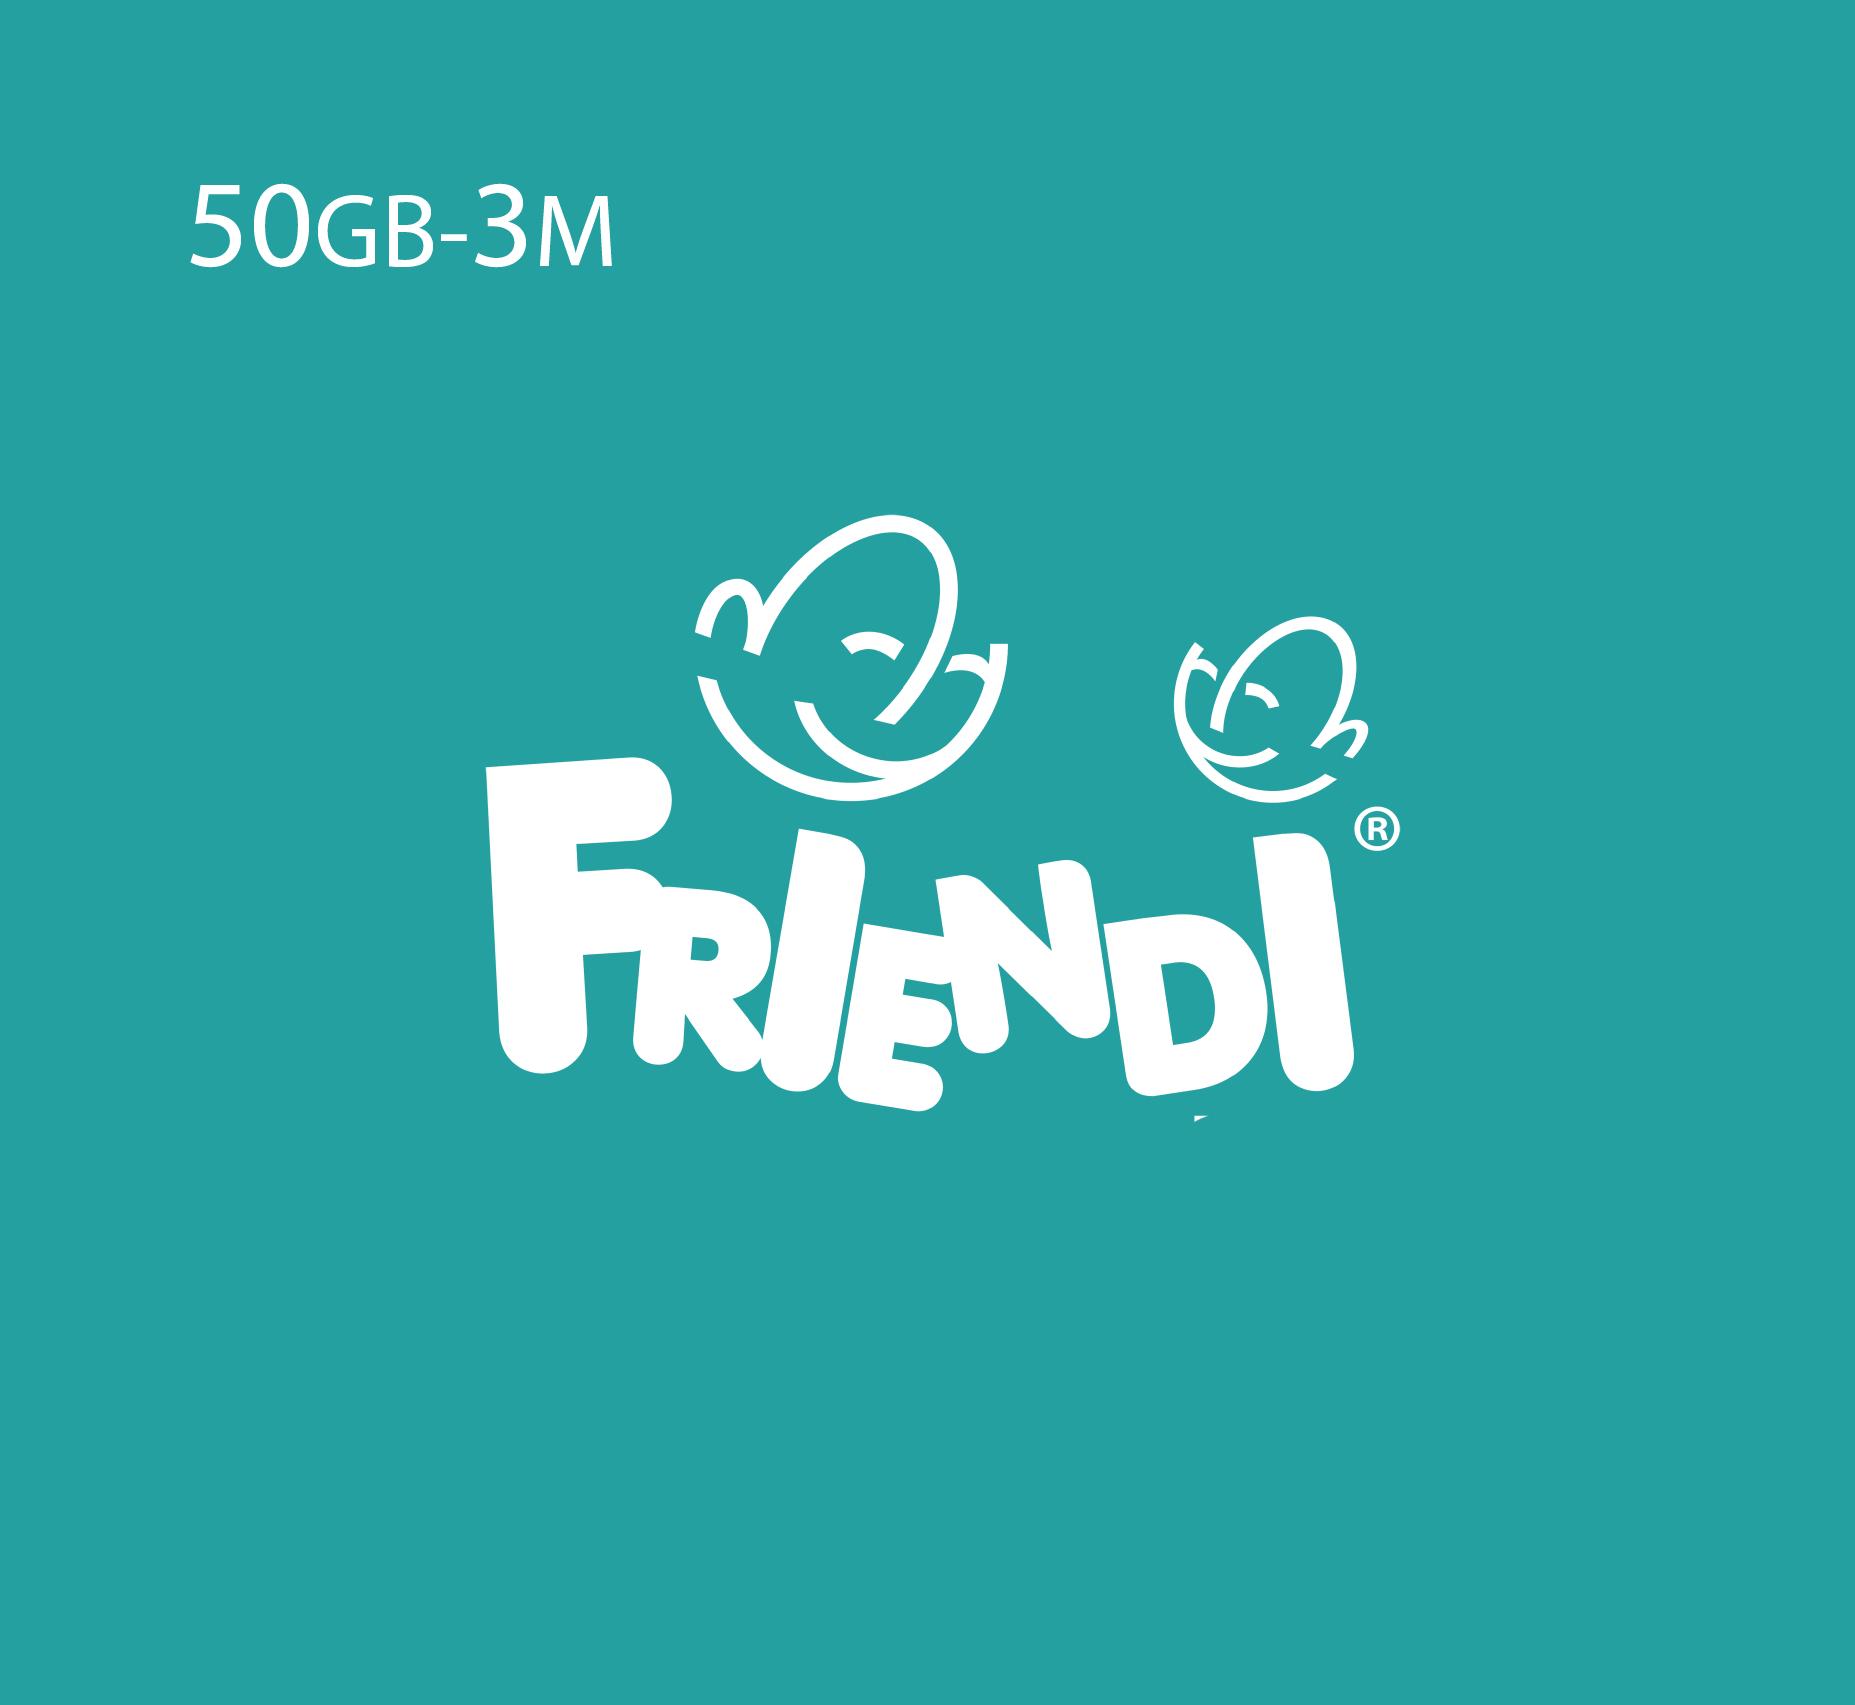 Friendi Data Recharge 50 GB - 3 Months